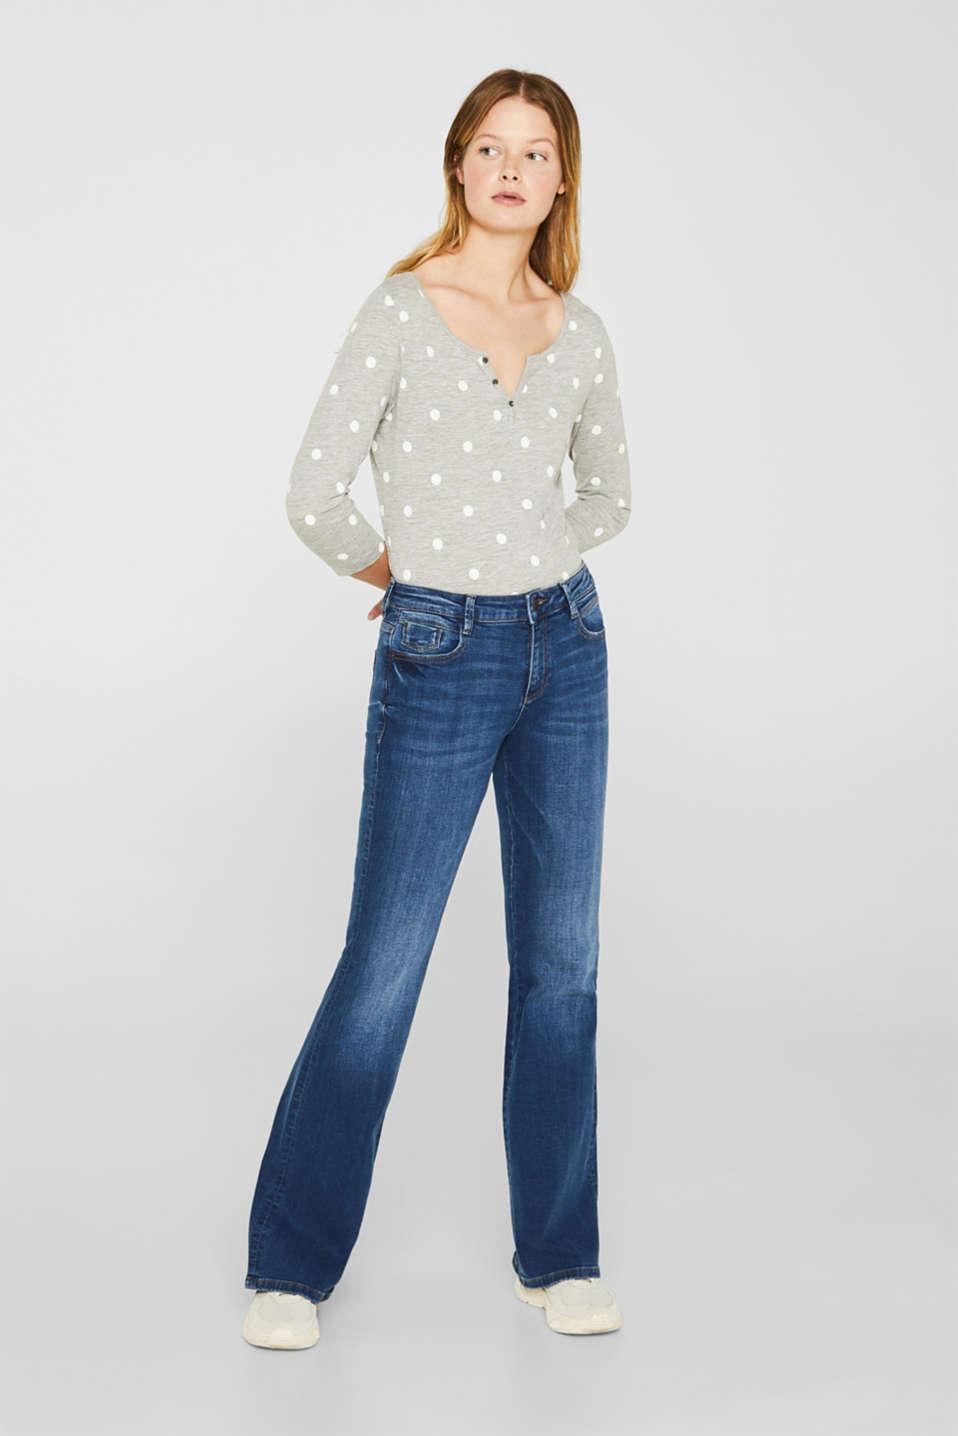 Melange long sleeve top with a polka dot print, LIGHT GREY 5, detail image number 1